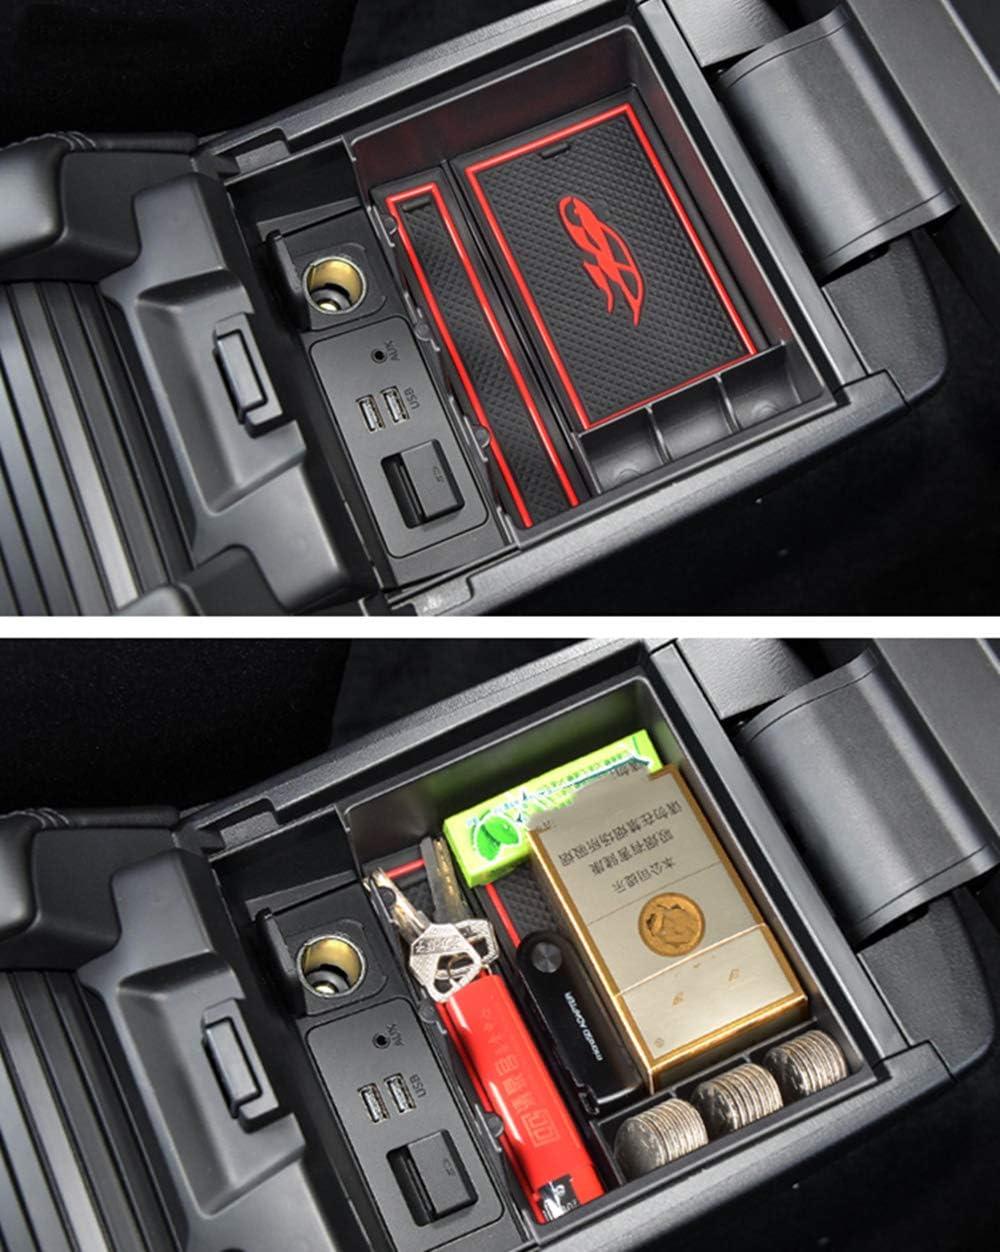 Para M azda CX-4 Caja de almacenamiento del apoyabrazos Con tapete antideslizante Car Central Consola interior para reposabrazos